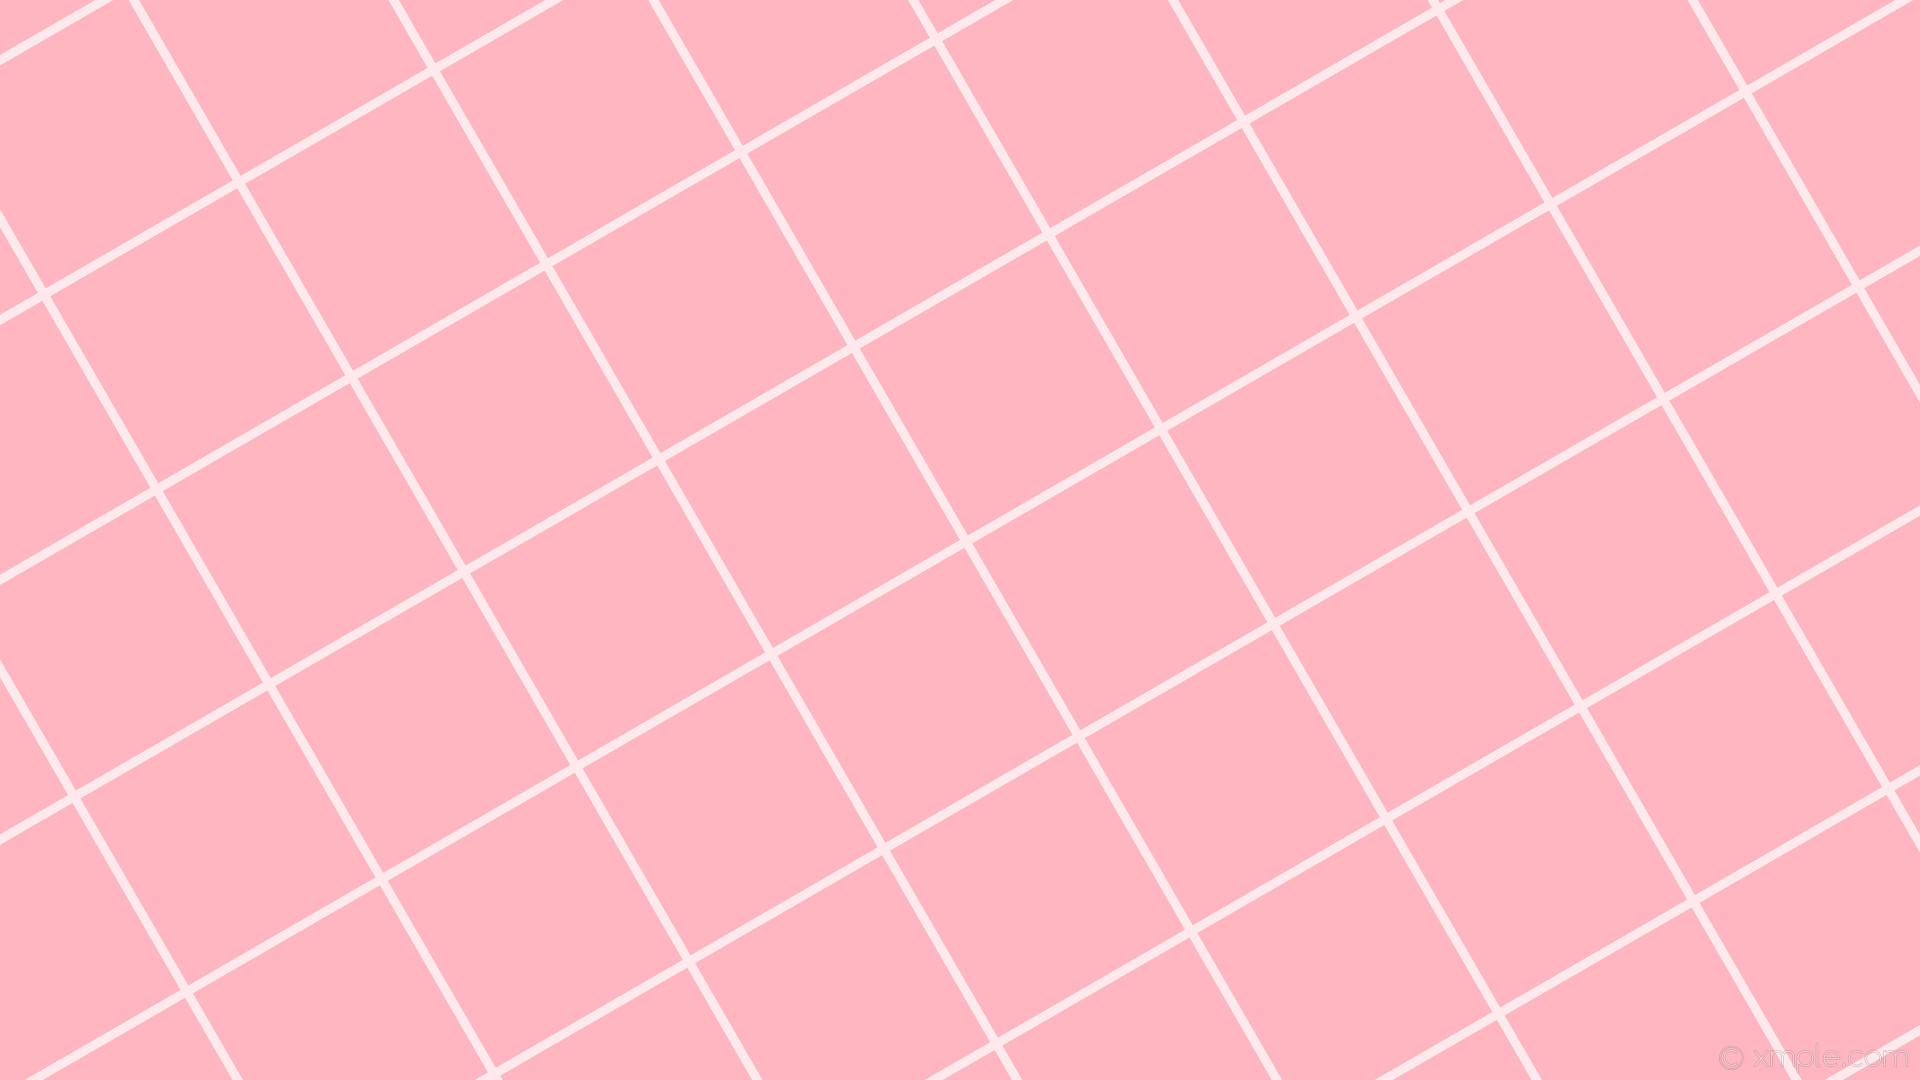 wallpaper white pink graph paper grid light pink #ffb6c1 #ffffff 30° 9px  225px